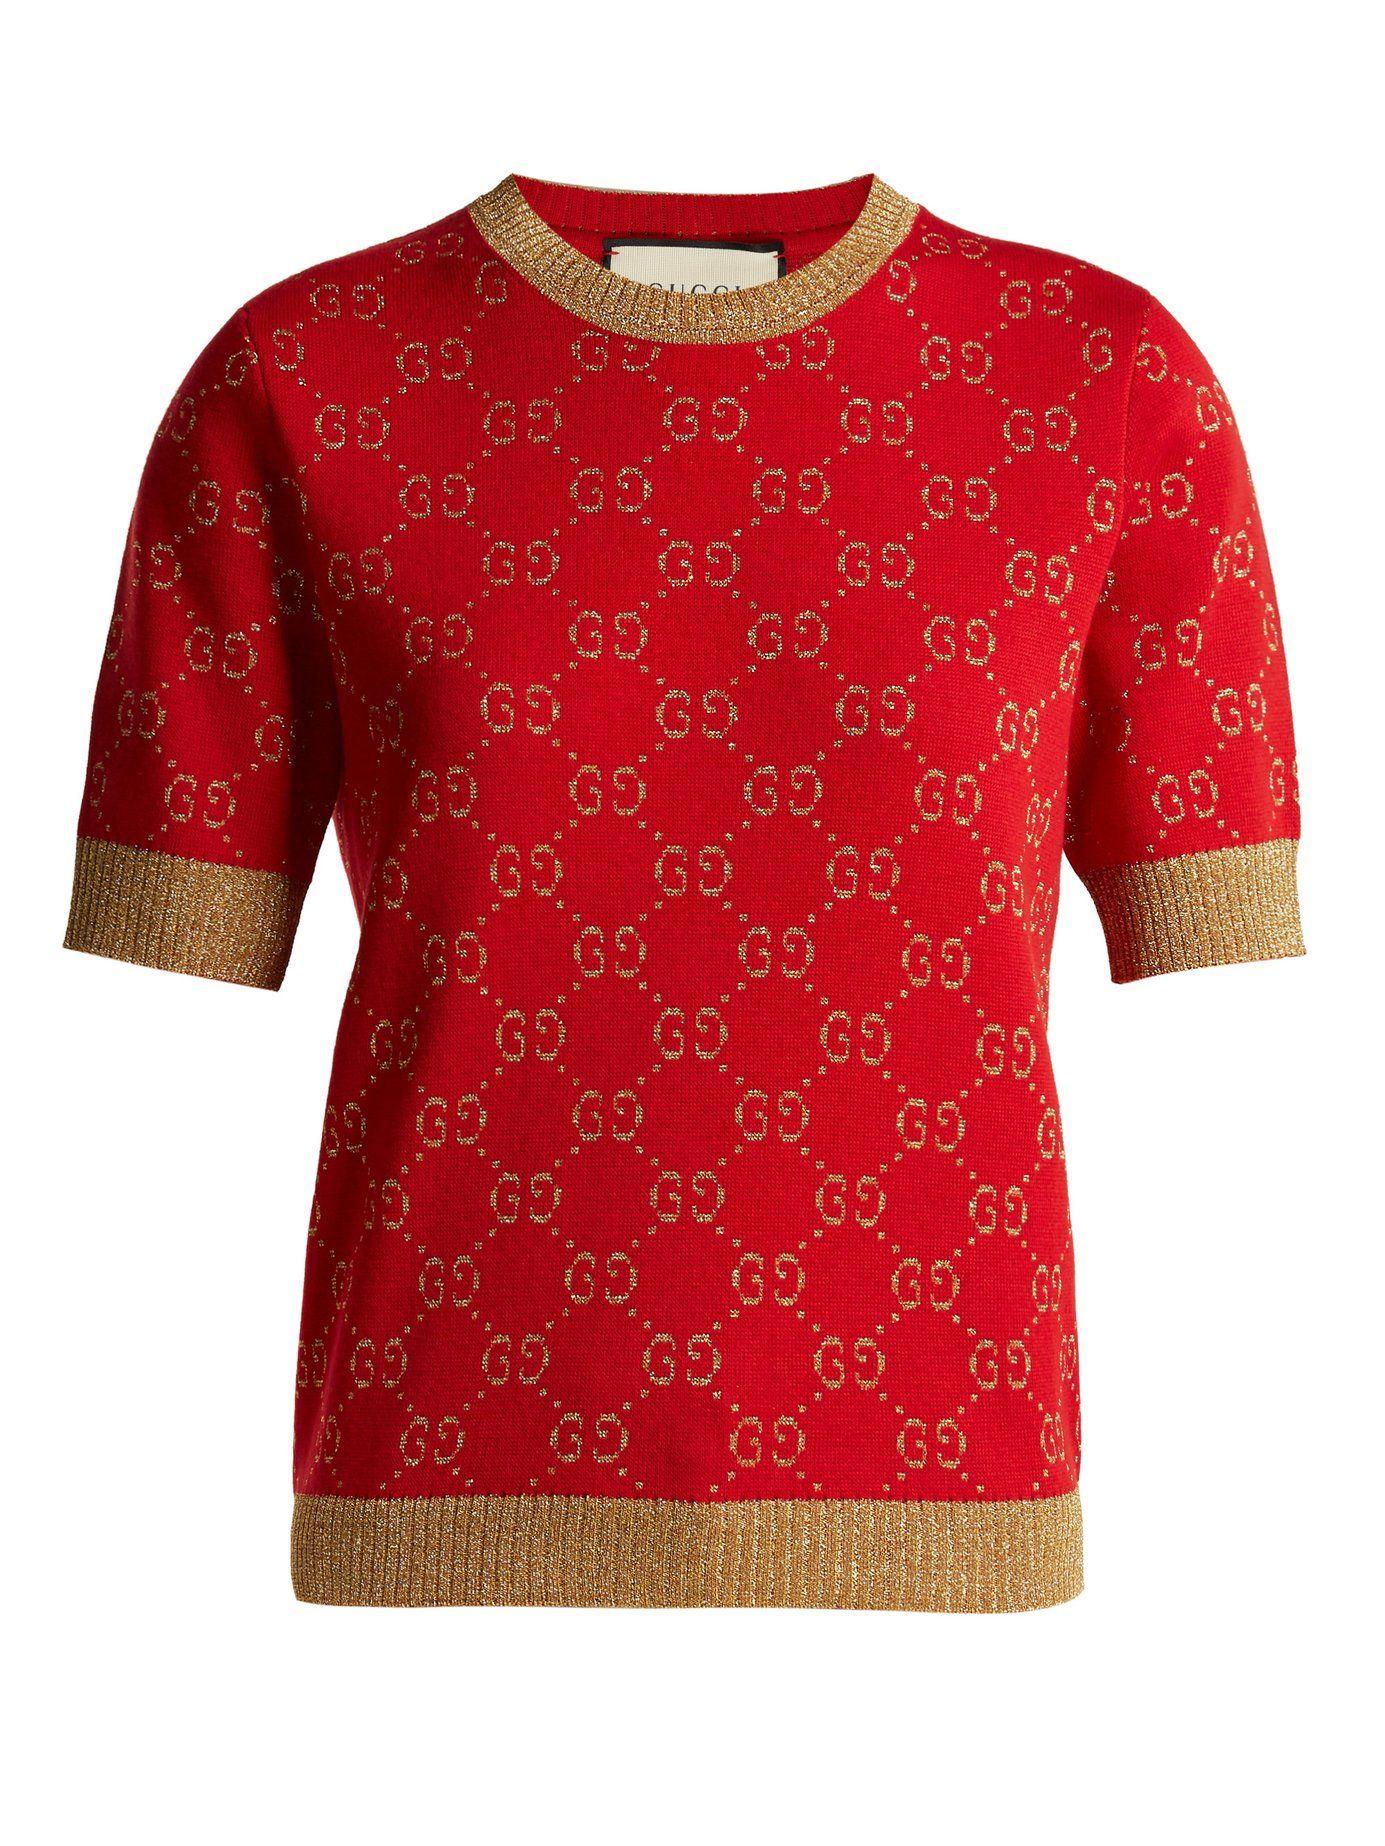 GG jacquardknit cottonblend sweater Gucci